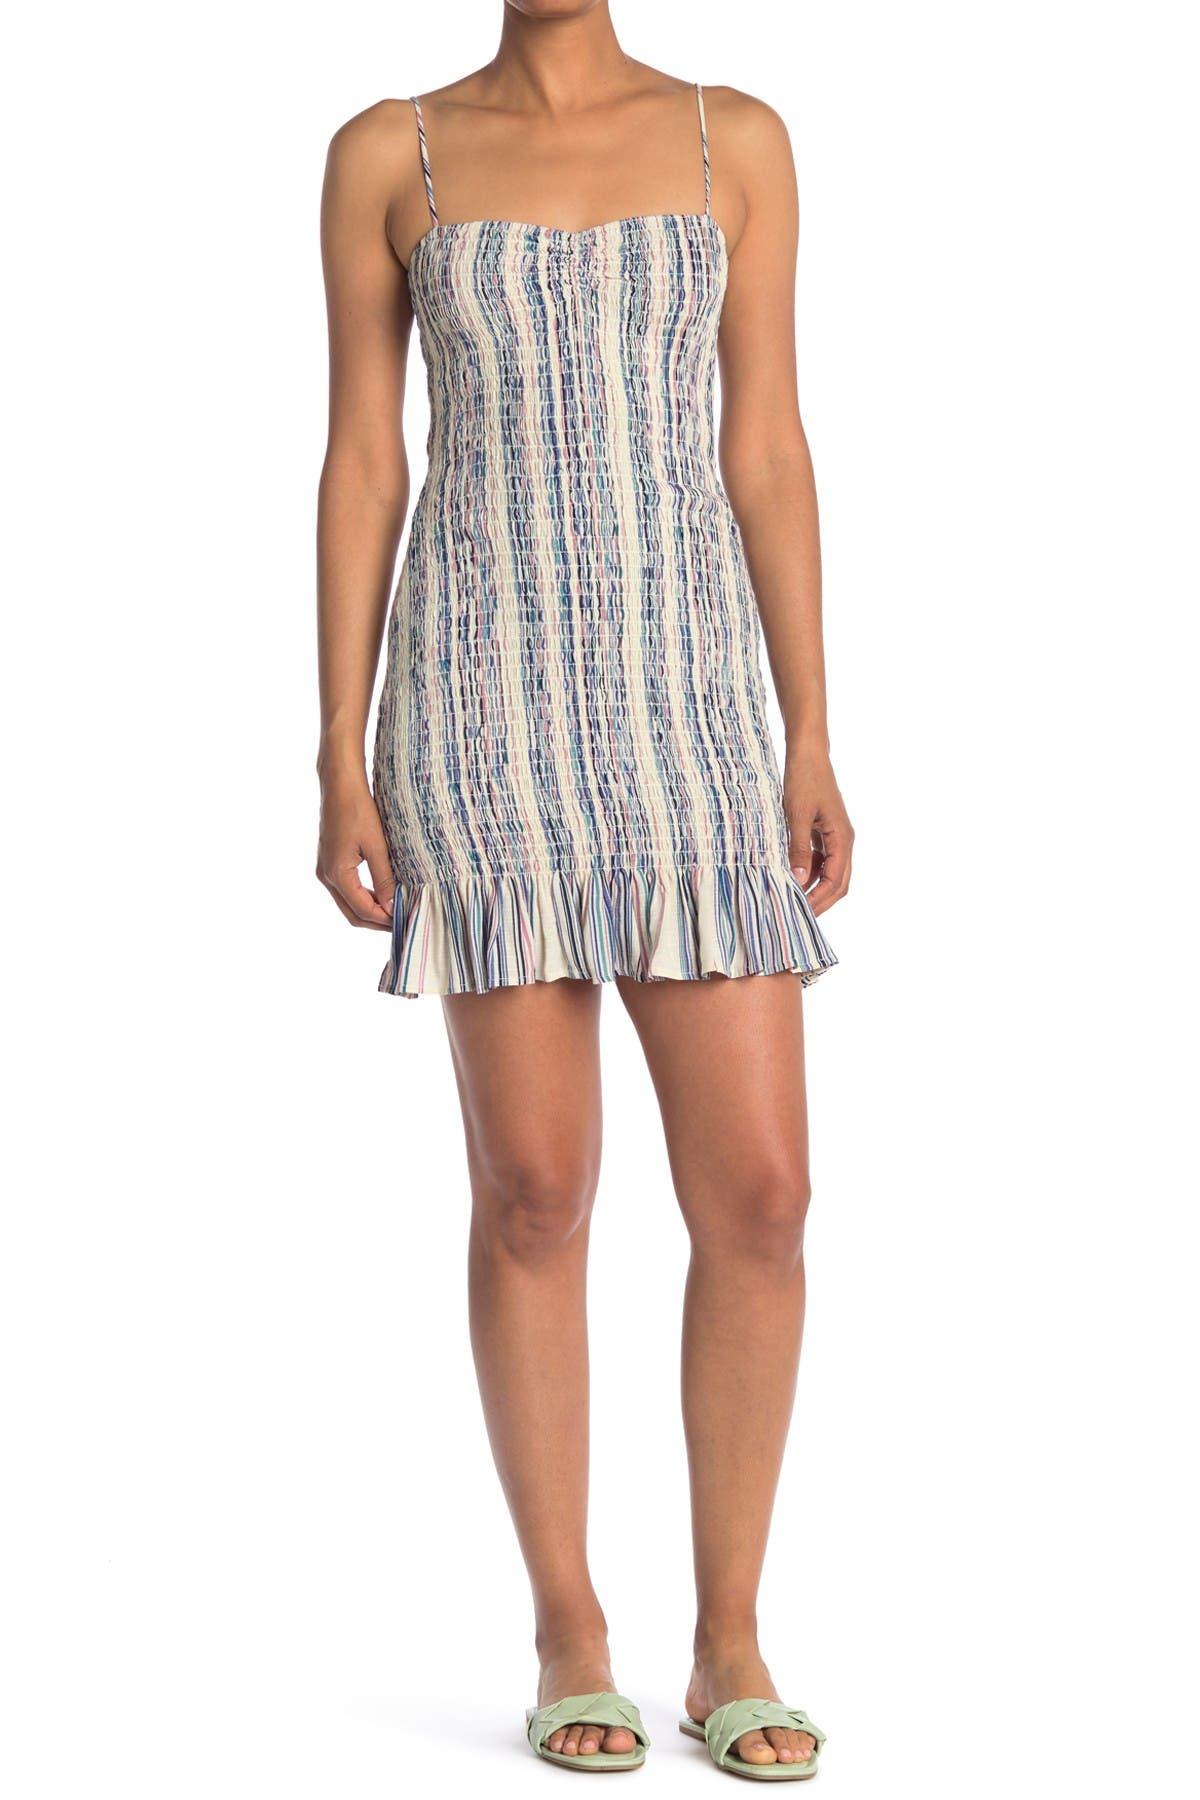 Image of ROW A Spaghetti Strap Smocked Striped Dress